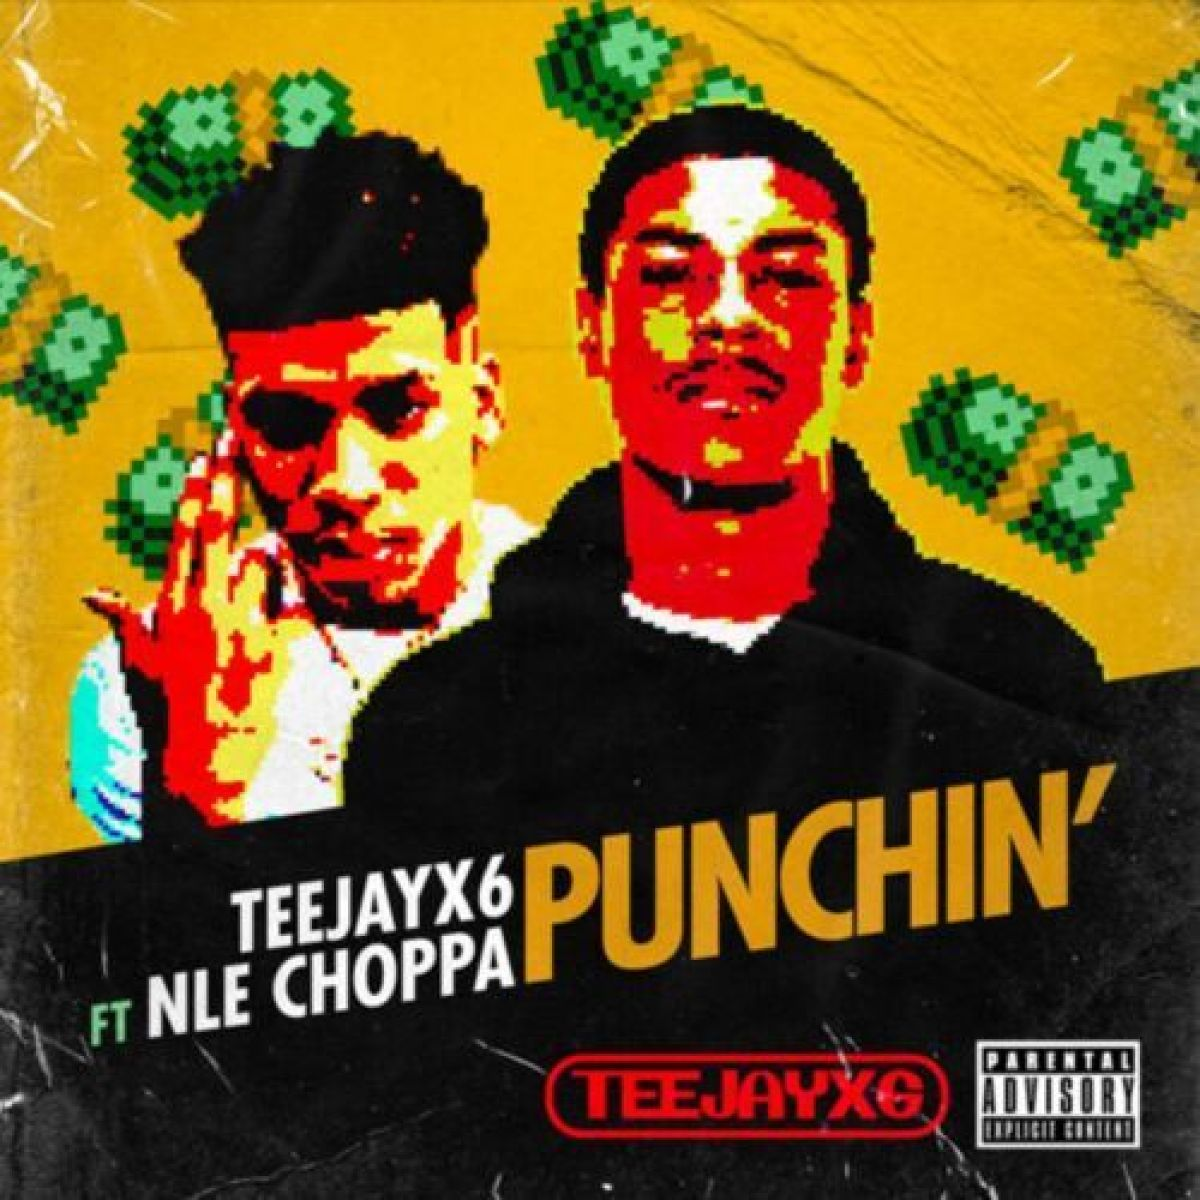 Mp3 Teejayx6 Ft. NLE Choppa – Punchin